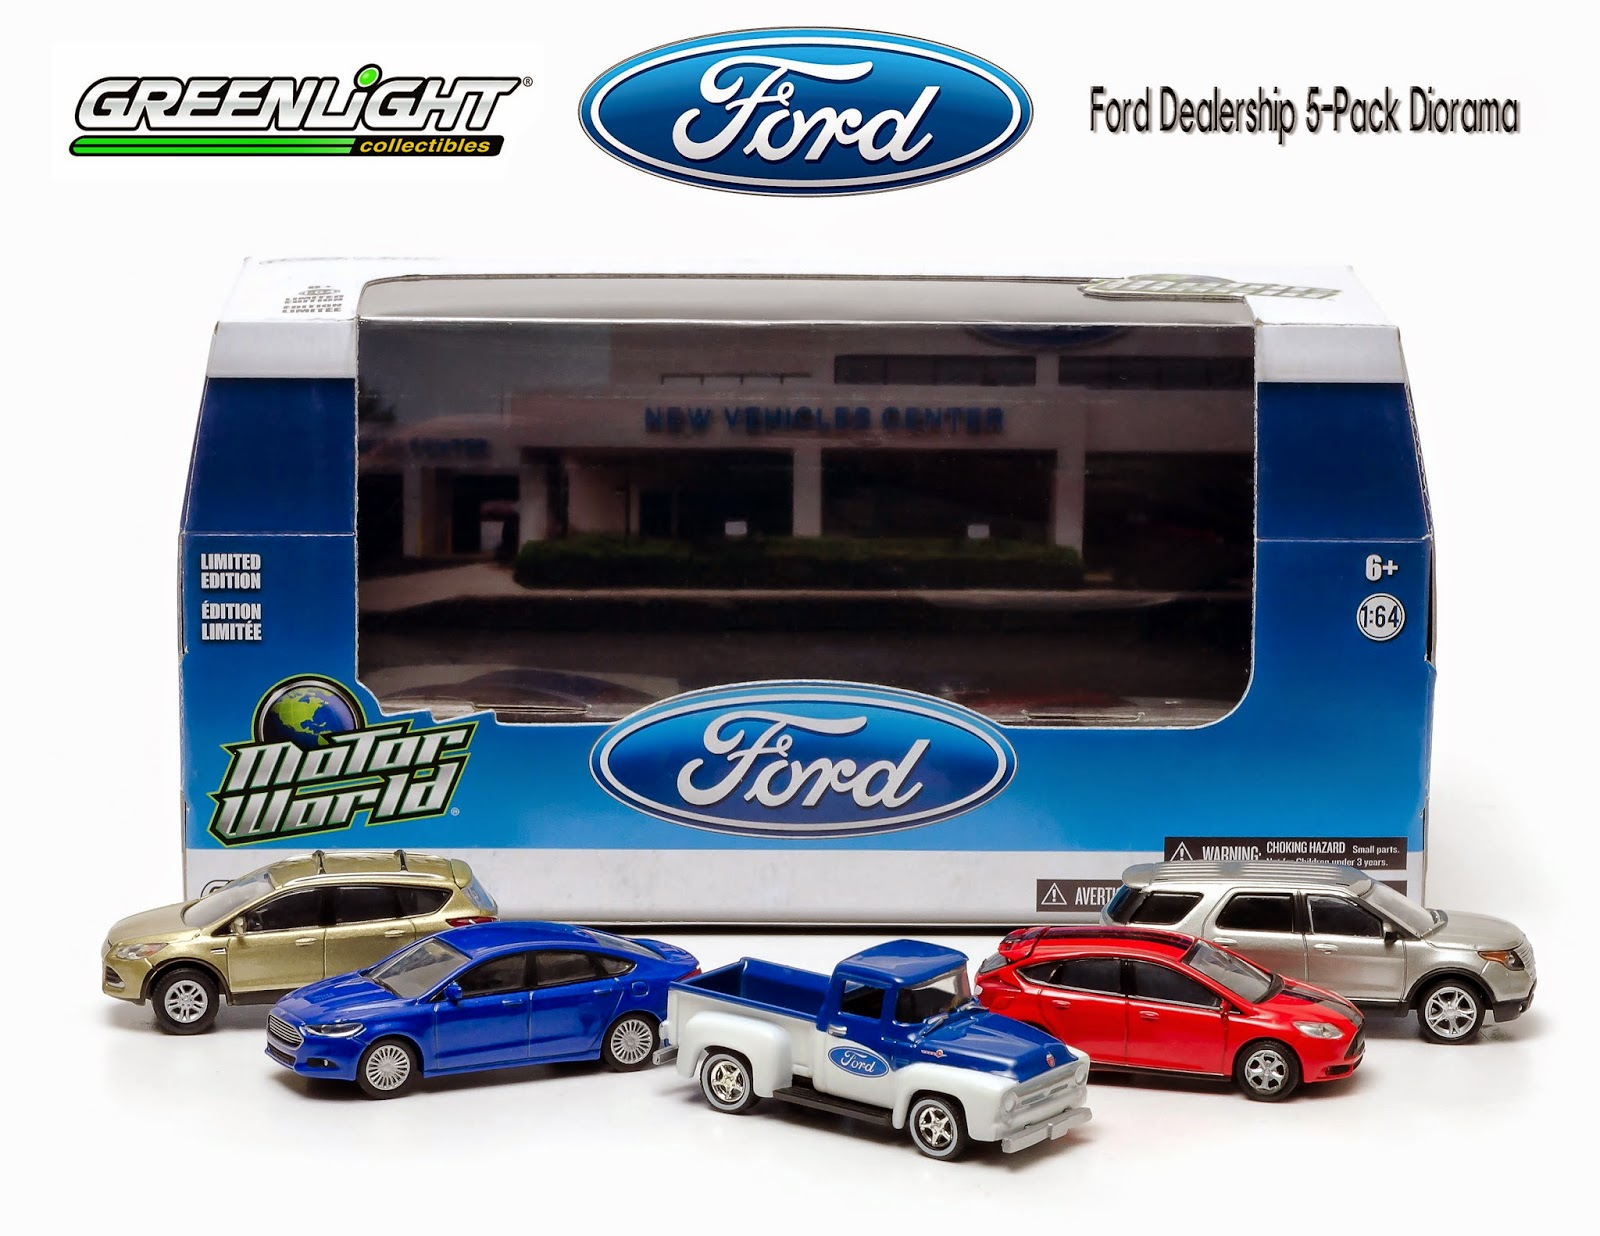 Diecast Hobbist Greenlight Ford Dealership 5 Pack Diorama